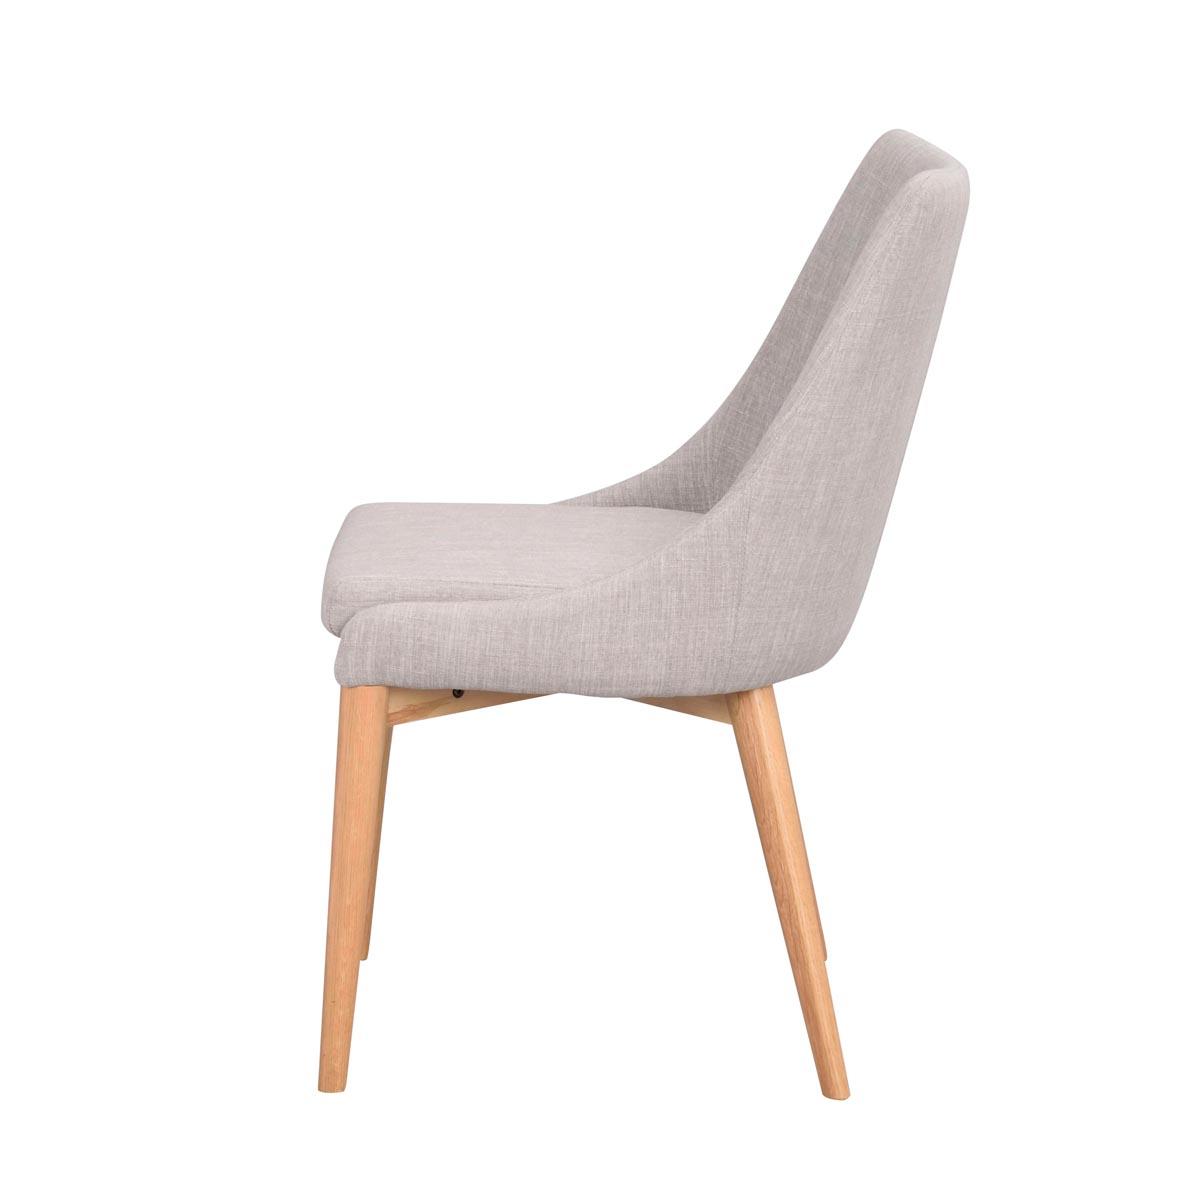 Bea-stol-ljusgrått-tyg_ek-R-118311_c